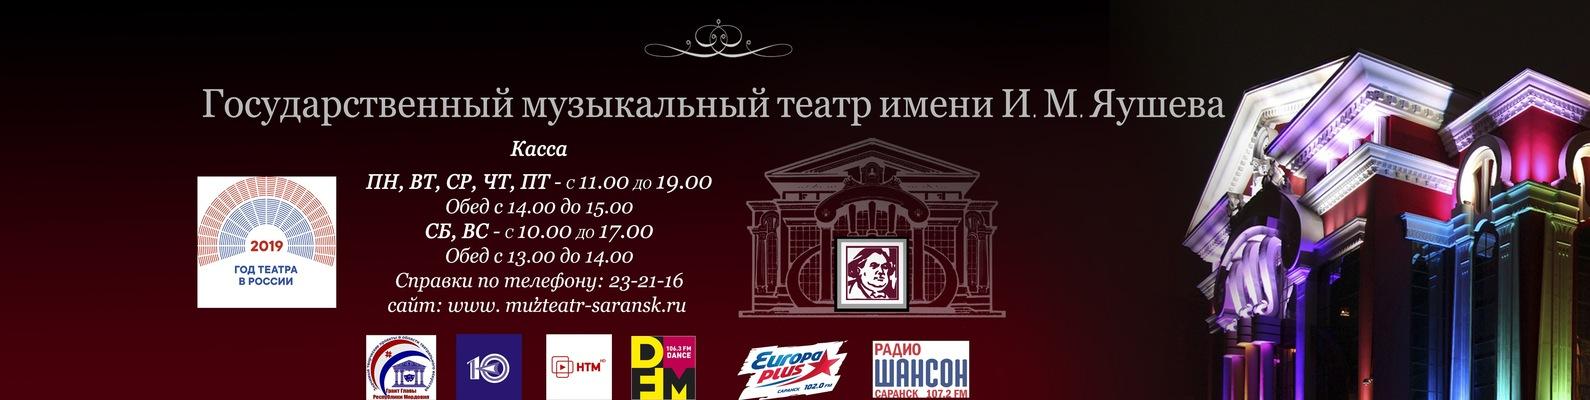 Афиша театра март саранск молодежные театры спб билеты